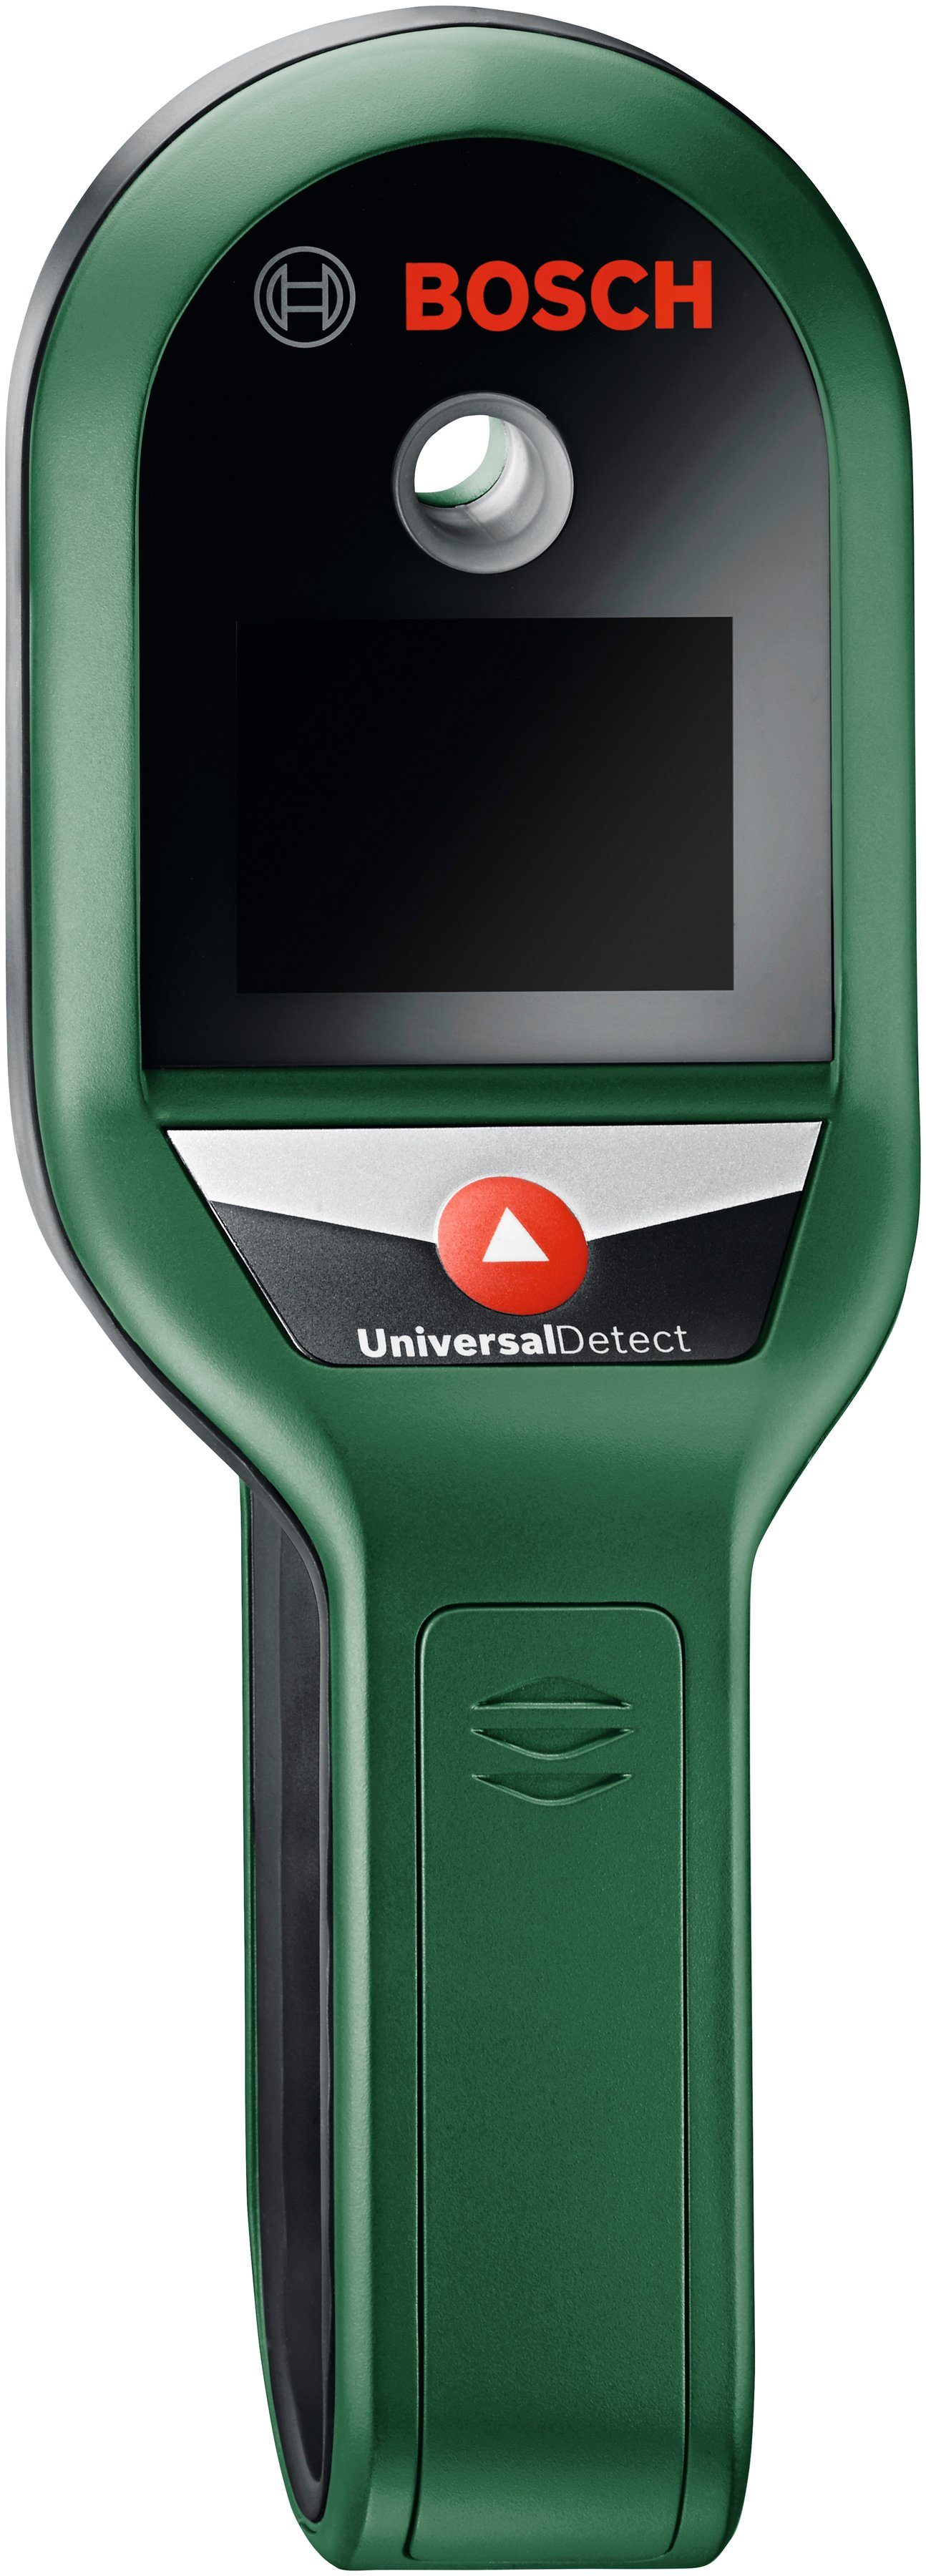 BOSCH Ortungsgerät »UniversalDetect«